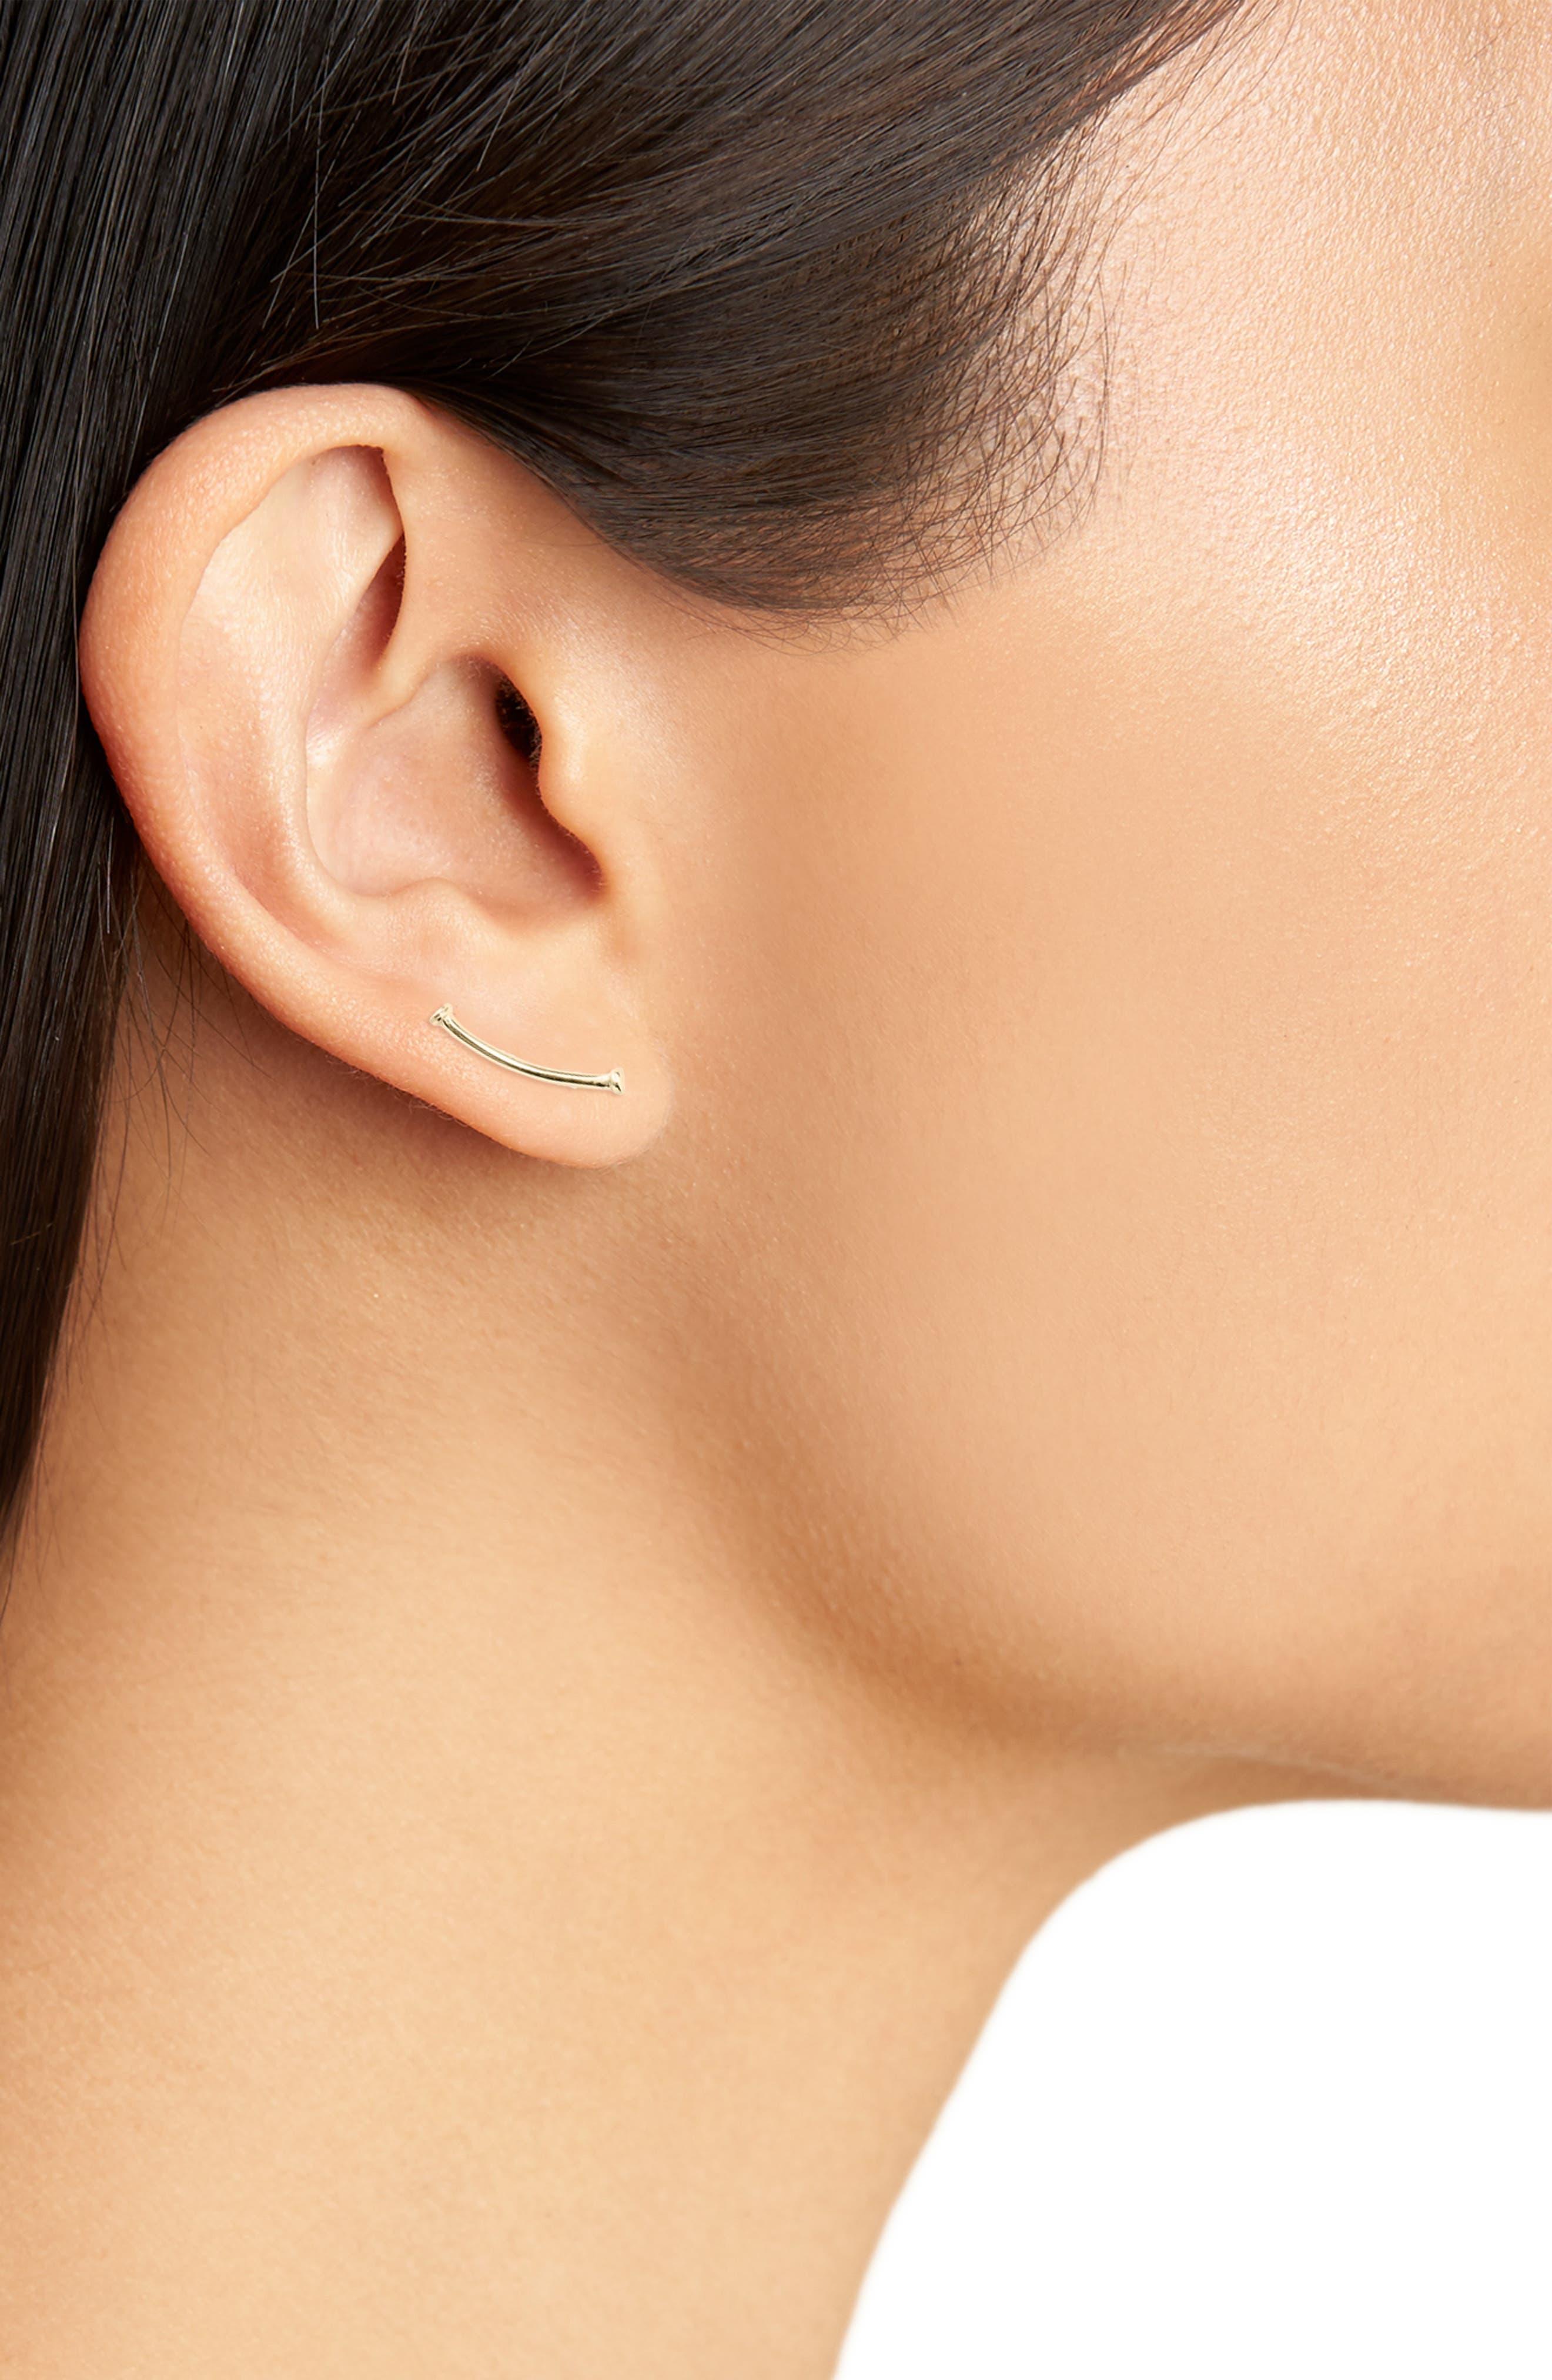 Skinny Curve Bar Stud Earrings,                             Alternate thumbnail 2, color,                             Yellow Gold